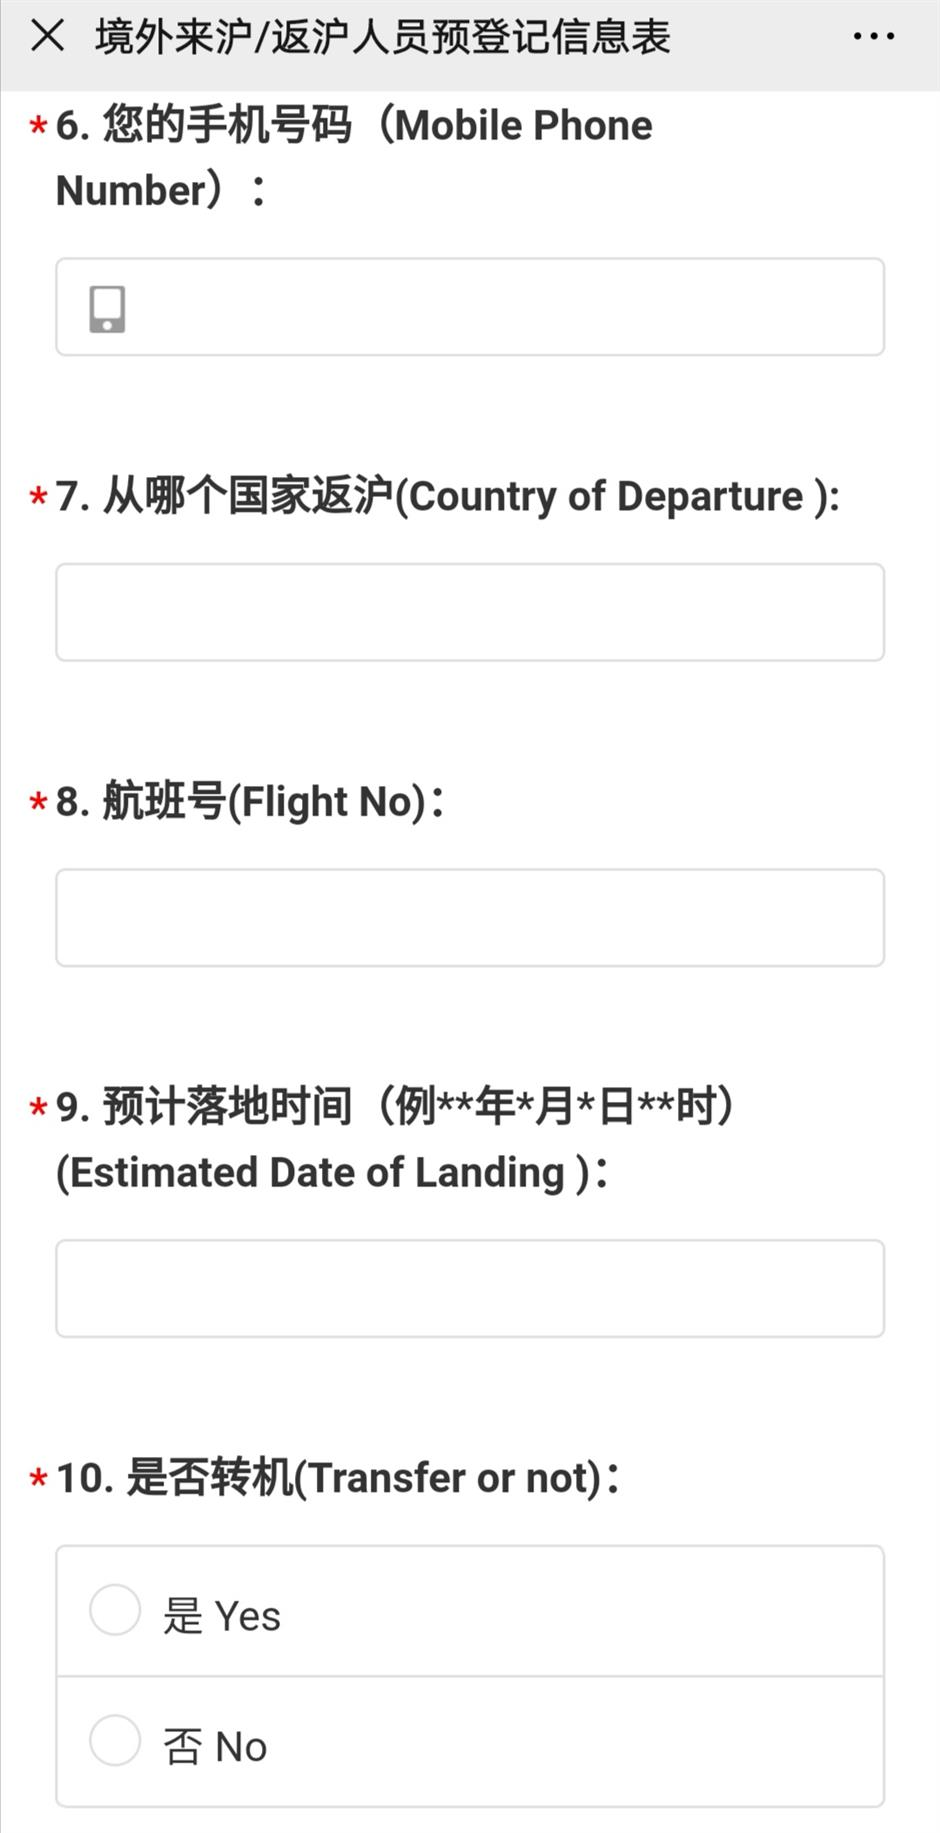 Online form for returning city residents